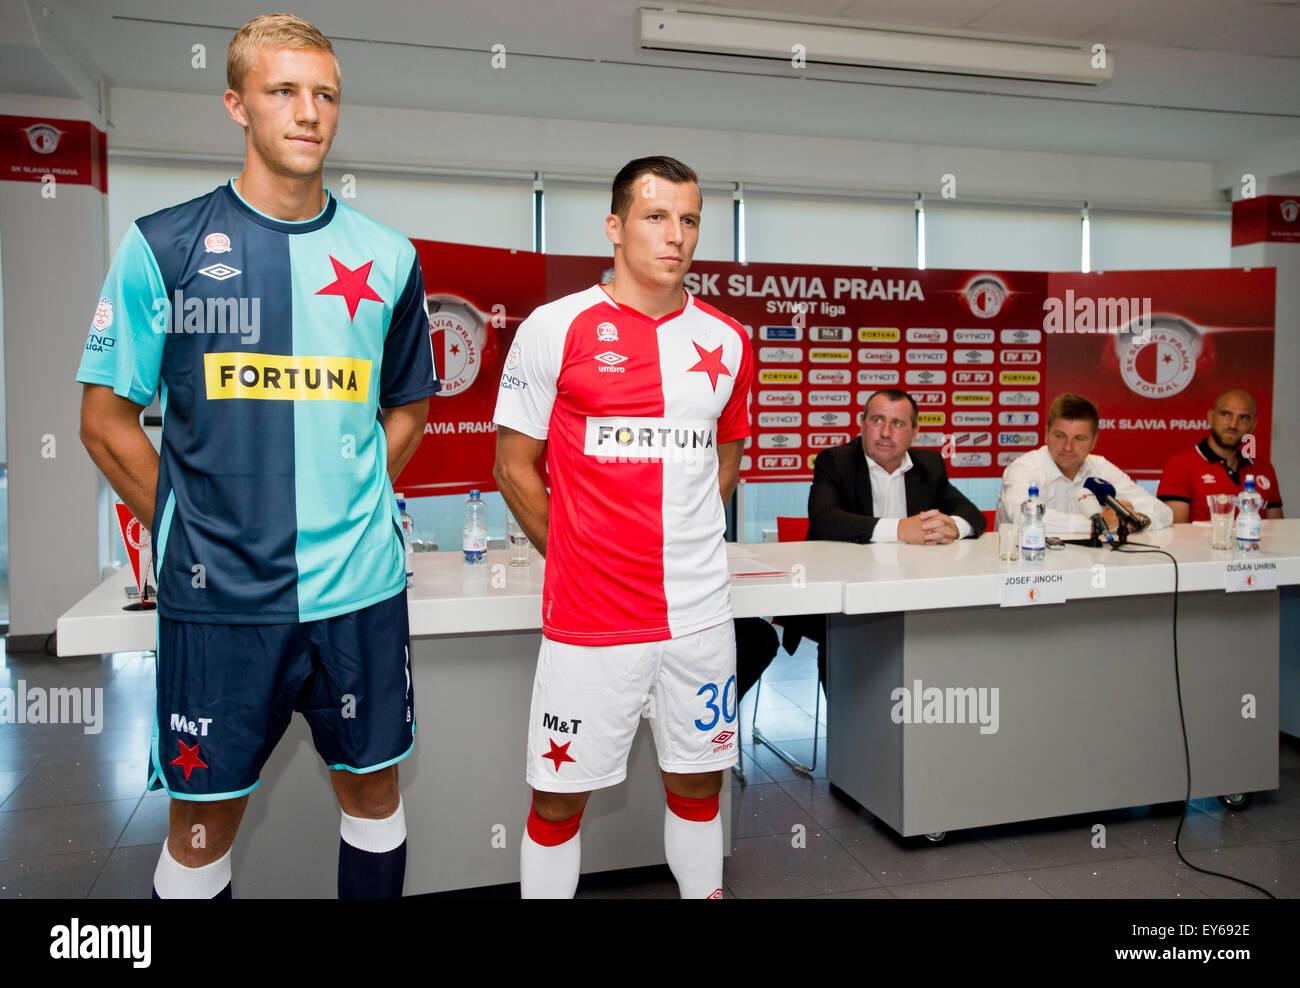 Sk Slavia Image: Prague, Czech Republic. 22nd July, 2015. Players Of SK